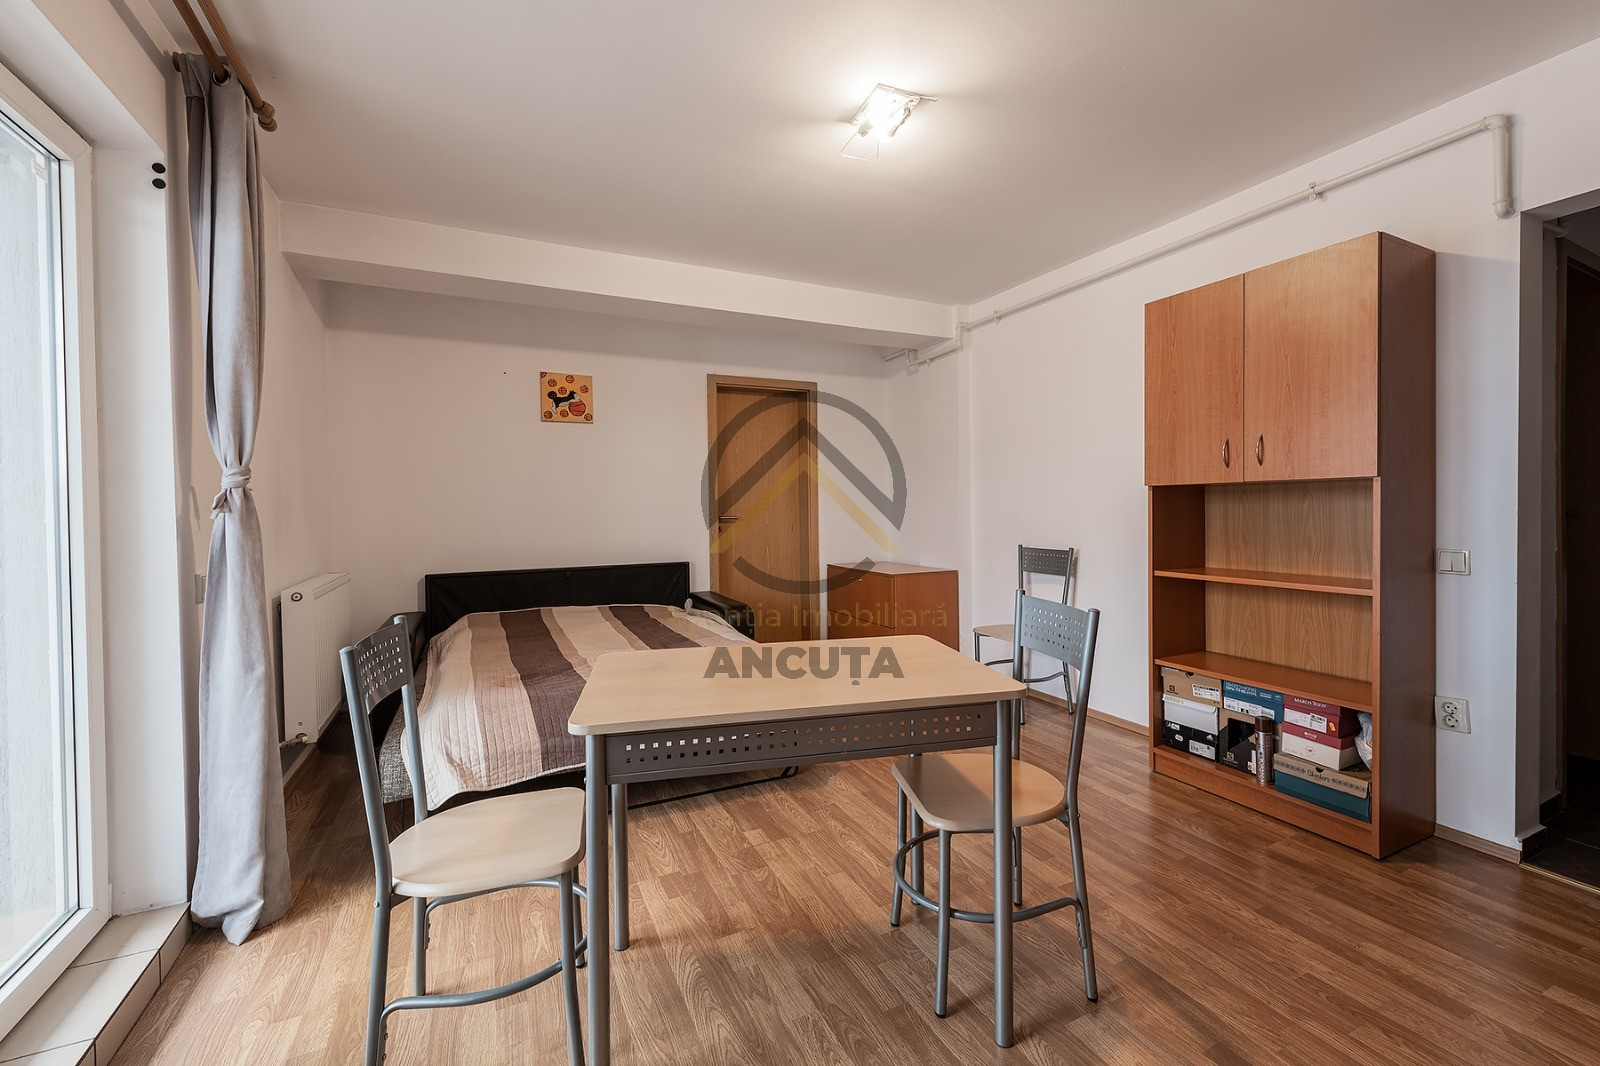 189545-Vanzare apartament 1 camera, Calea Turzii, Cluj-Napoca